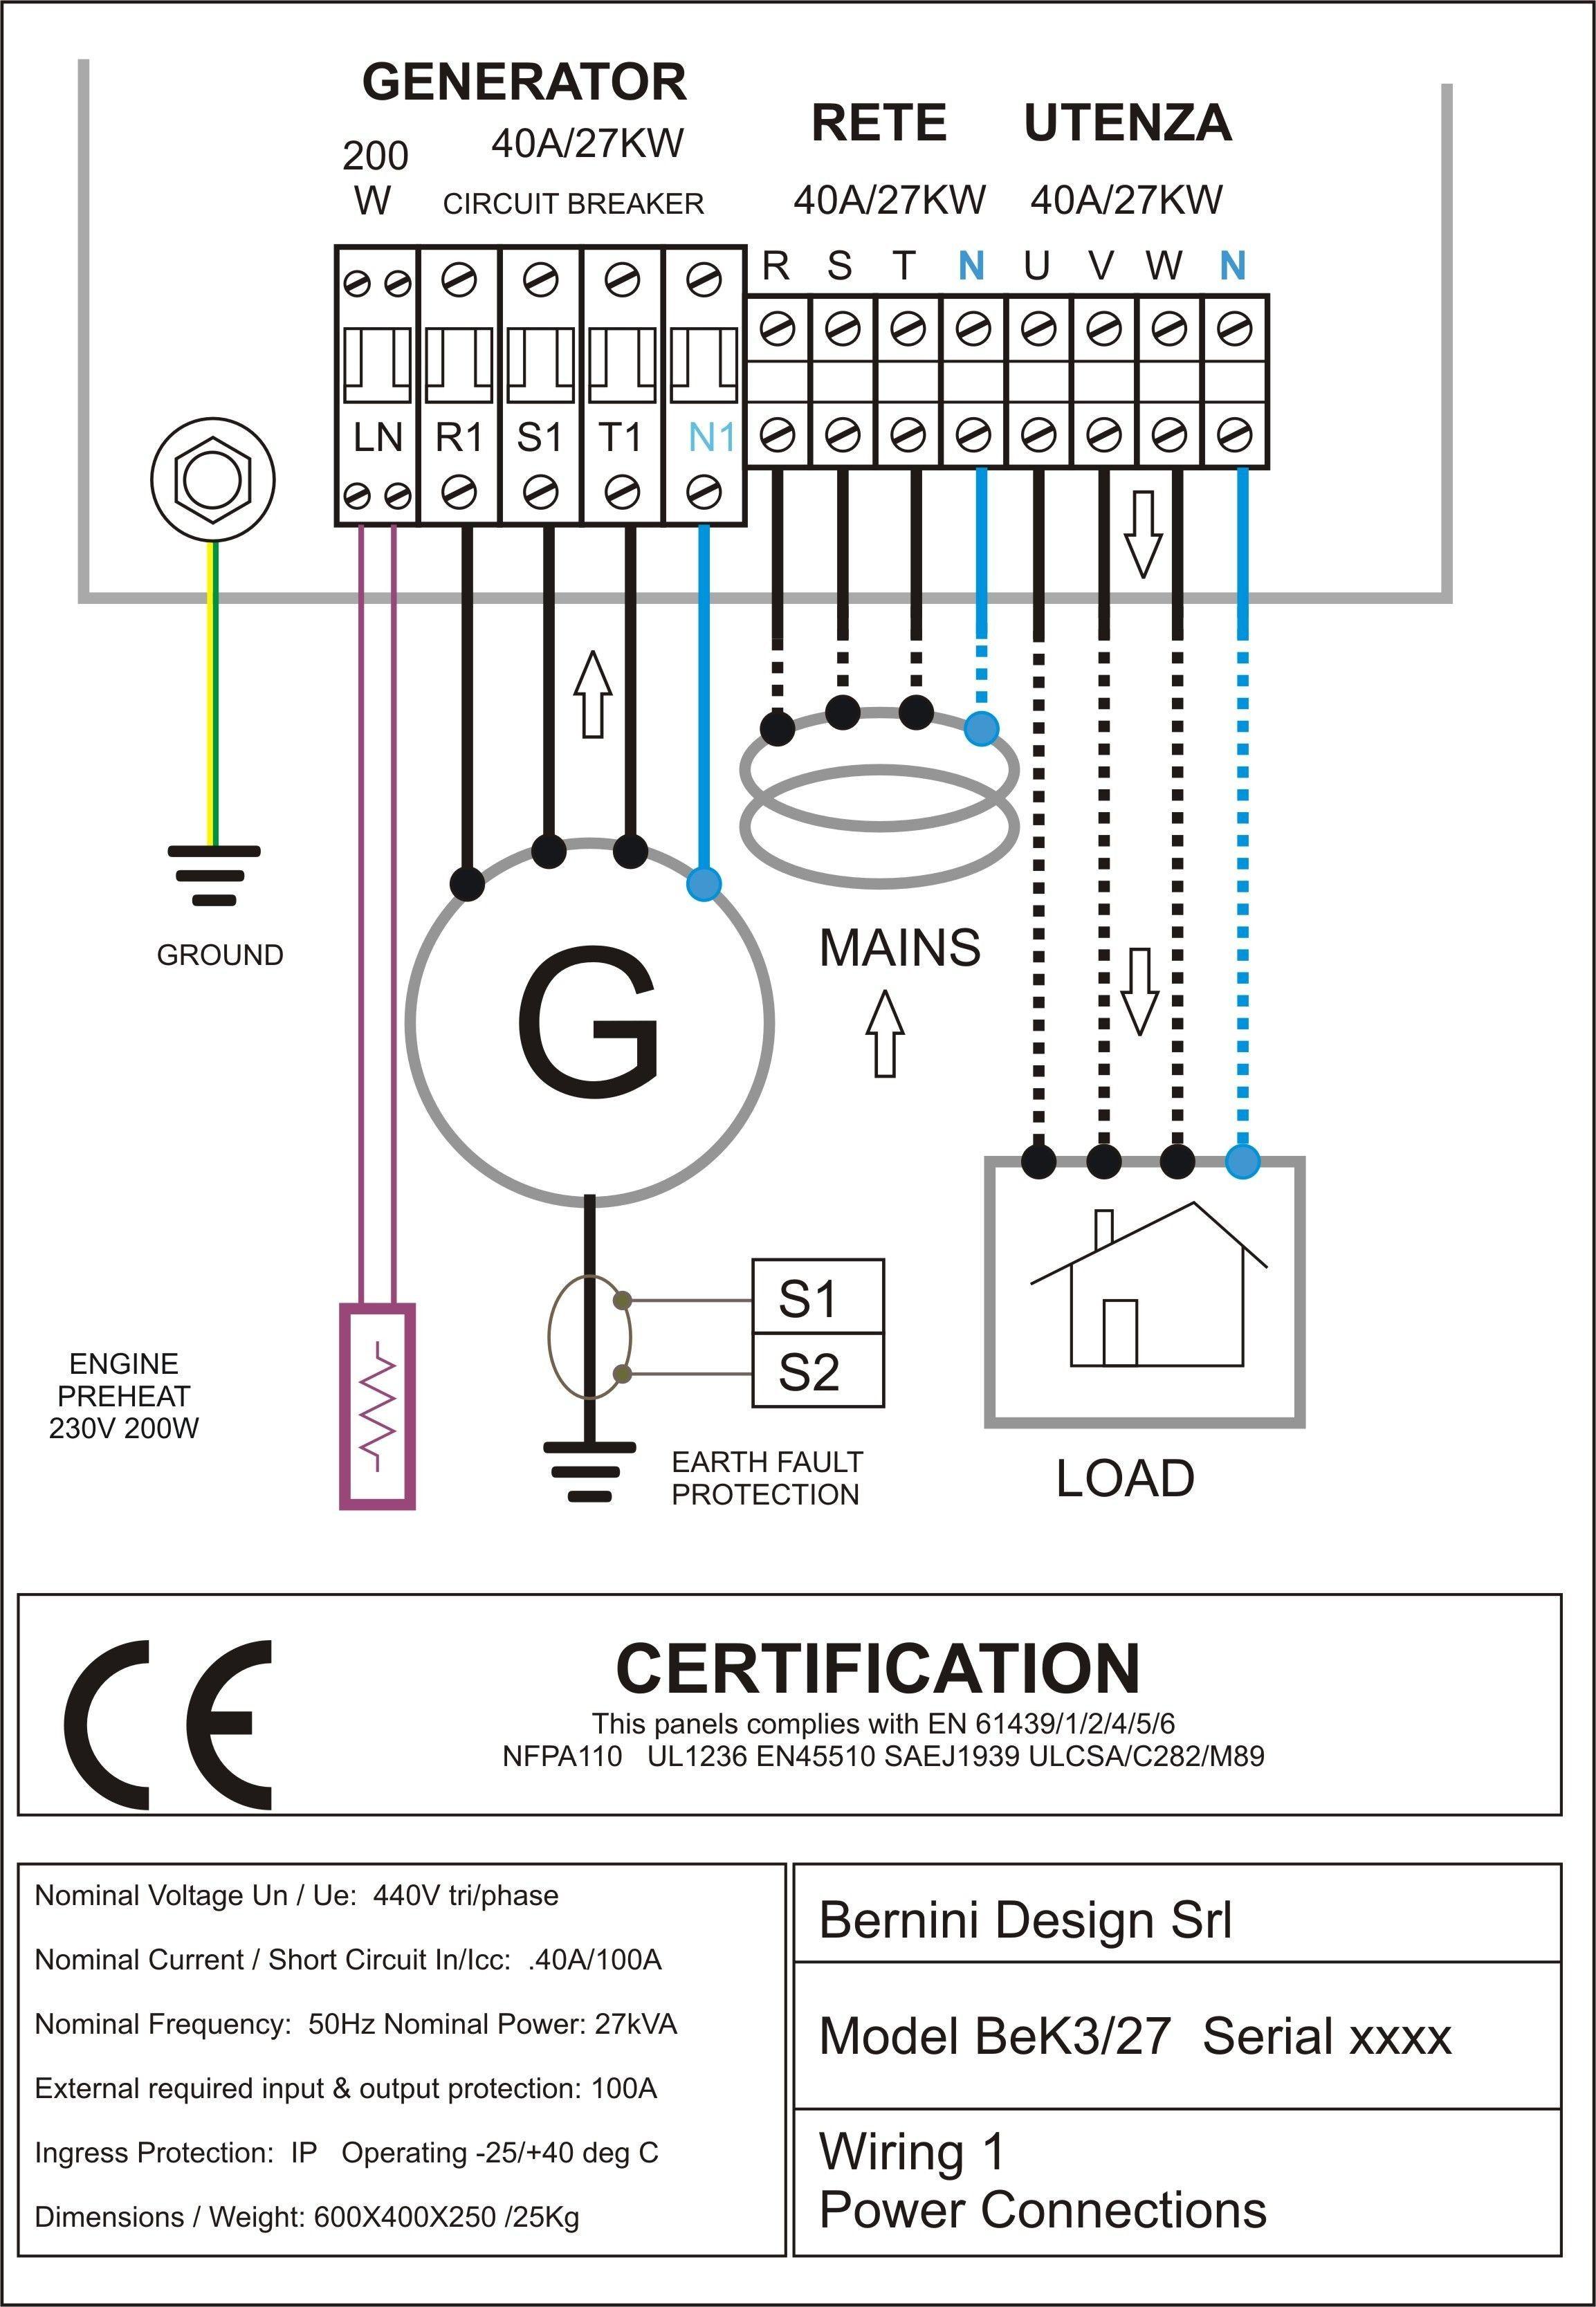 New Mitsubishi Generator Wiring Diagram Diagram Diagramsample Diagramtemplate Wiringdiagram Diagramchart Wo Electrical Circuit Diagram Diagram Generation